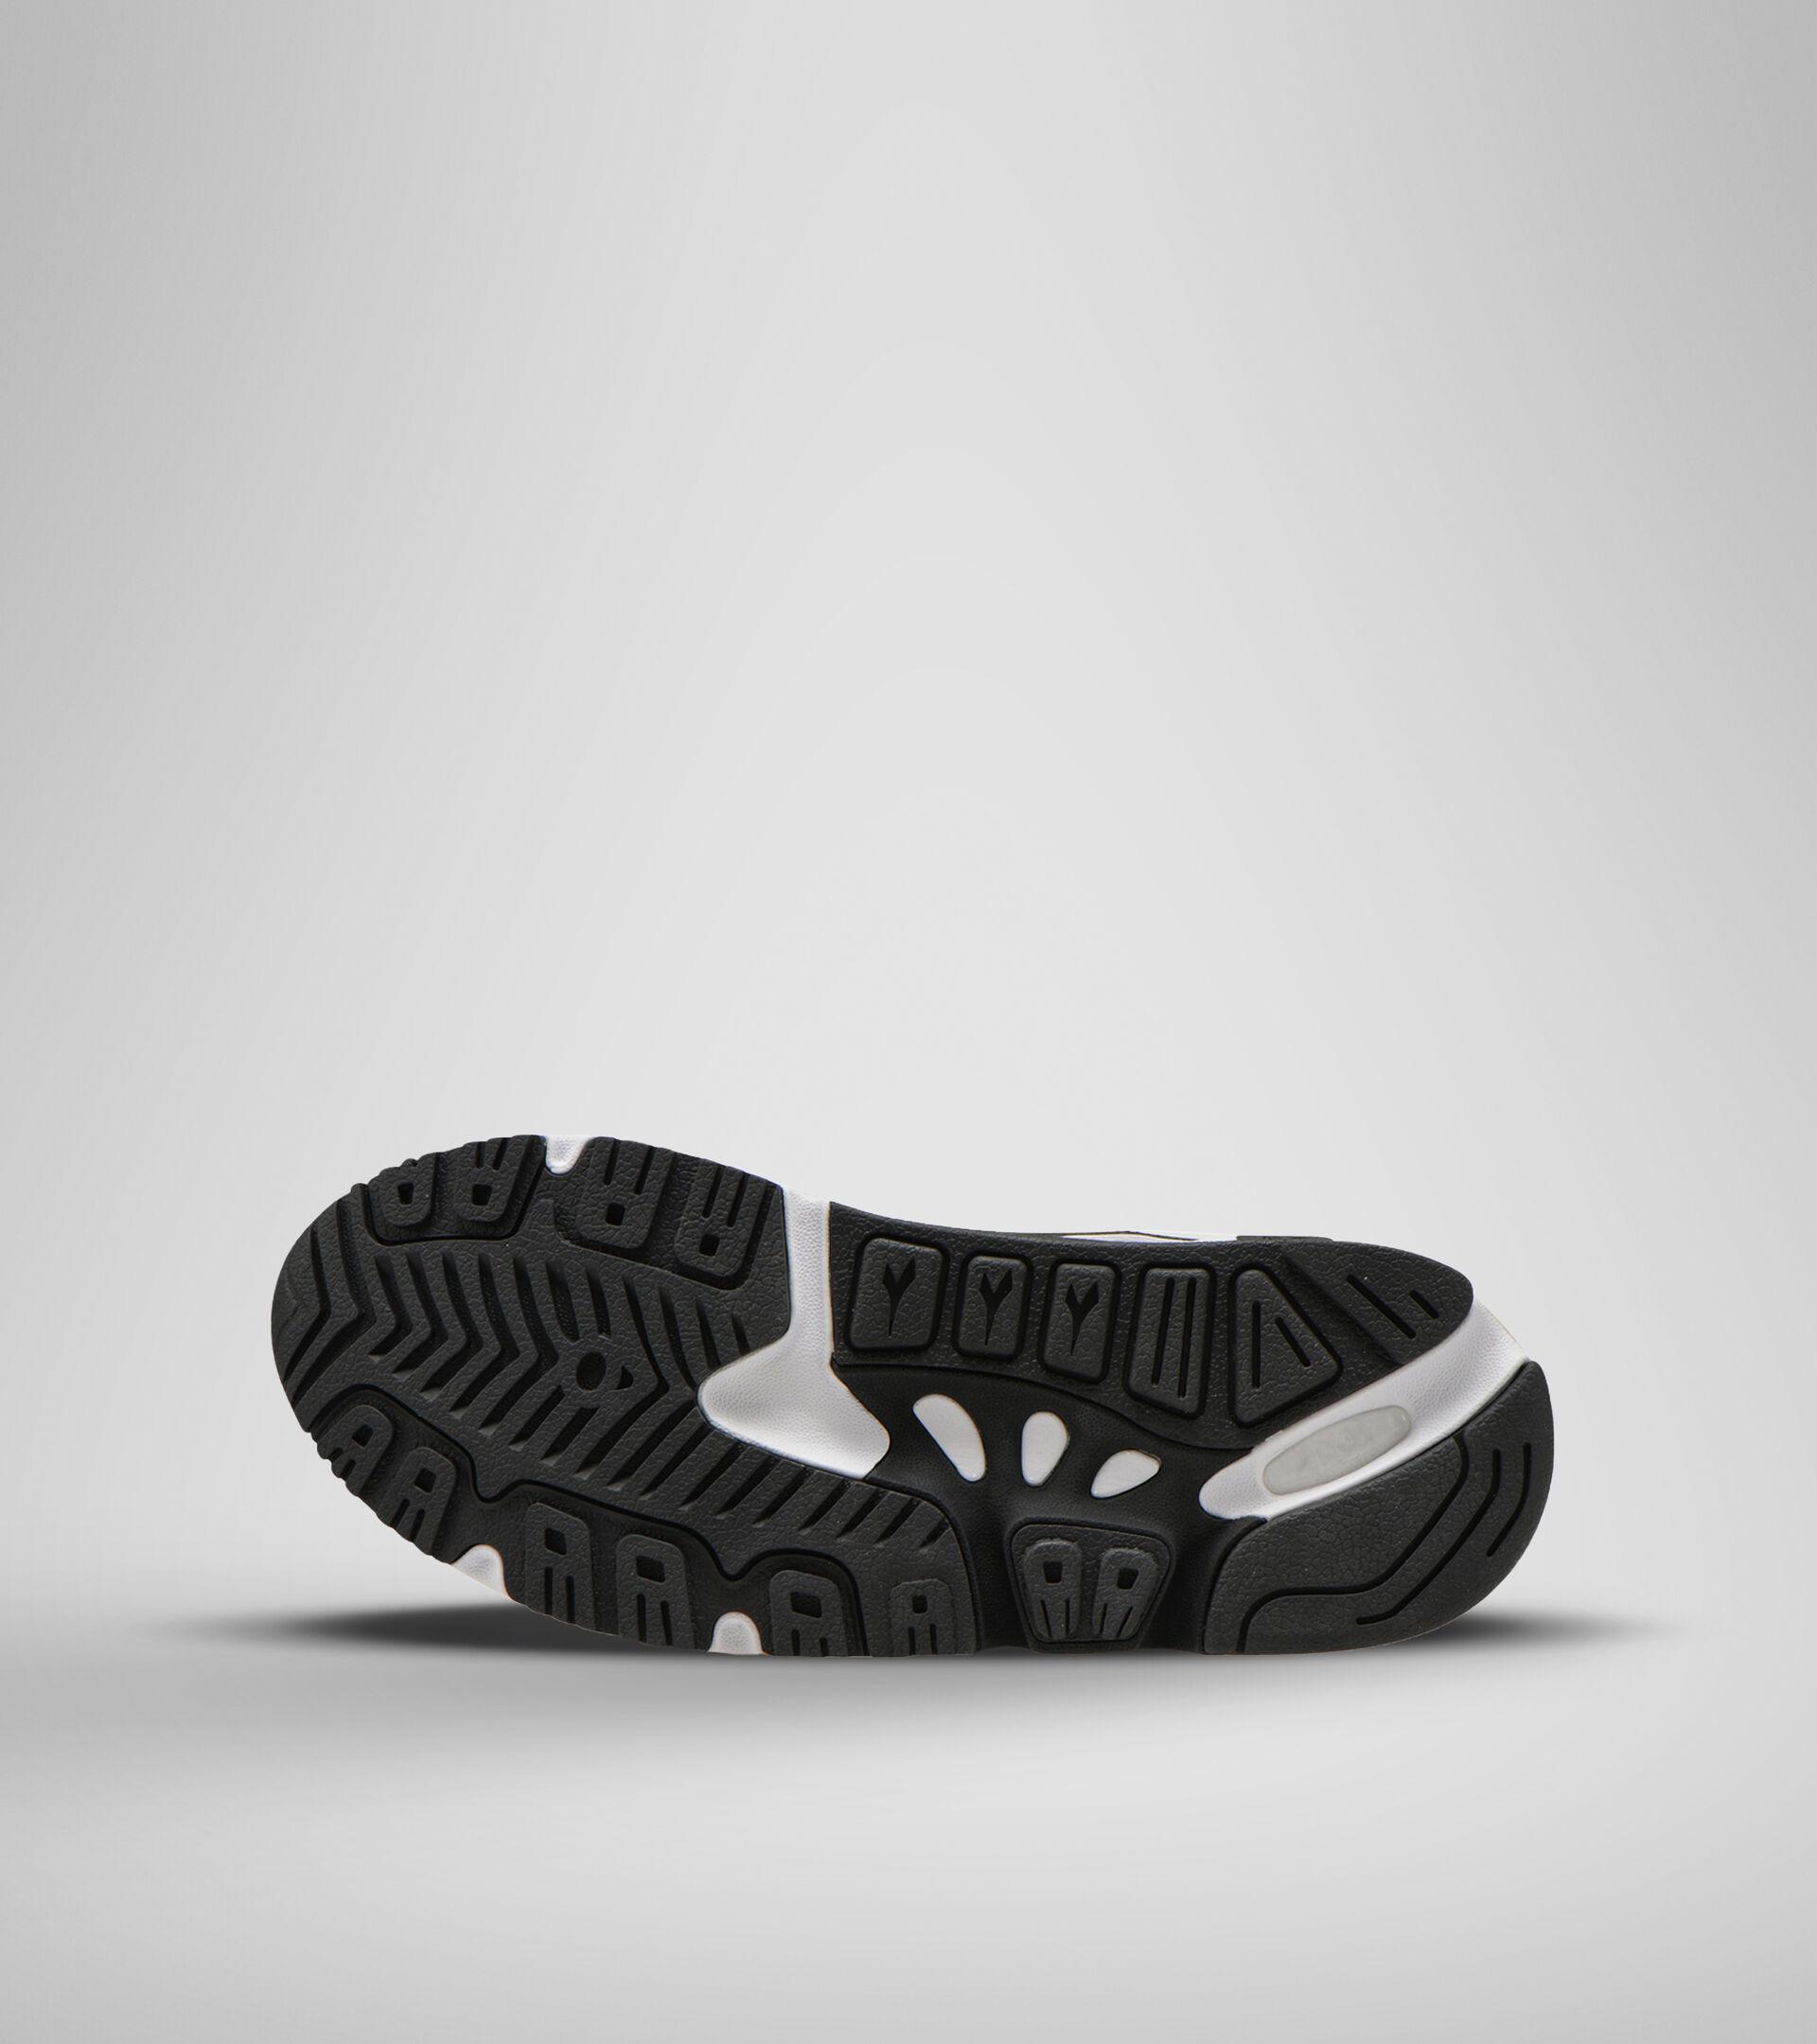 Footwear Sportswear UOMO MYTHOS SUEDE WHITE/BLACK/FIESTA Diadora